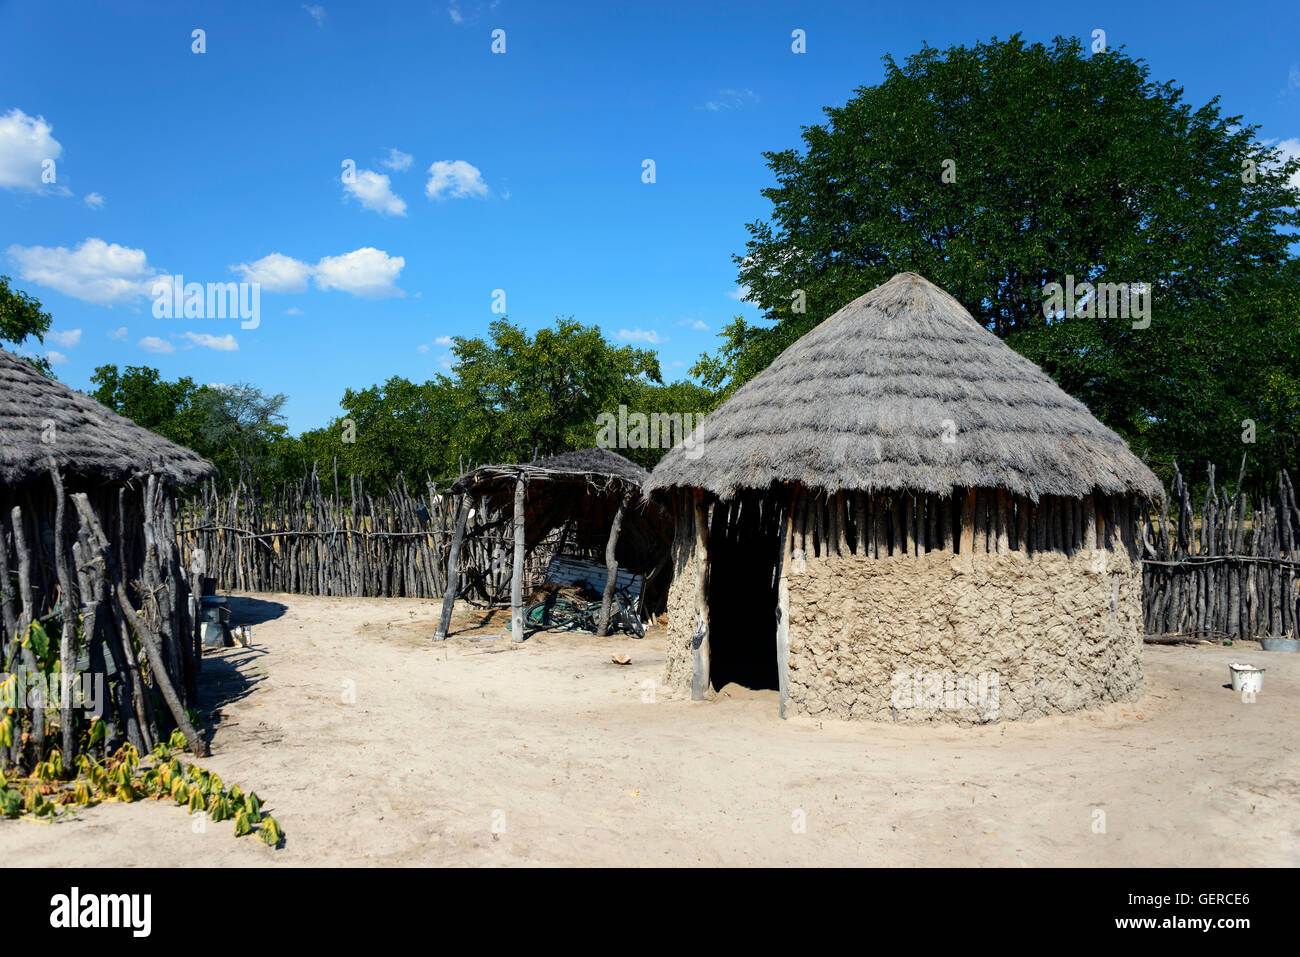 Housing area, Shorobe, Maun, North-West District, Botswana - Stock Image